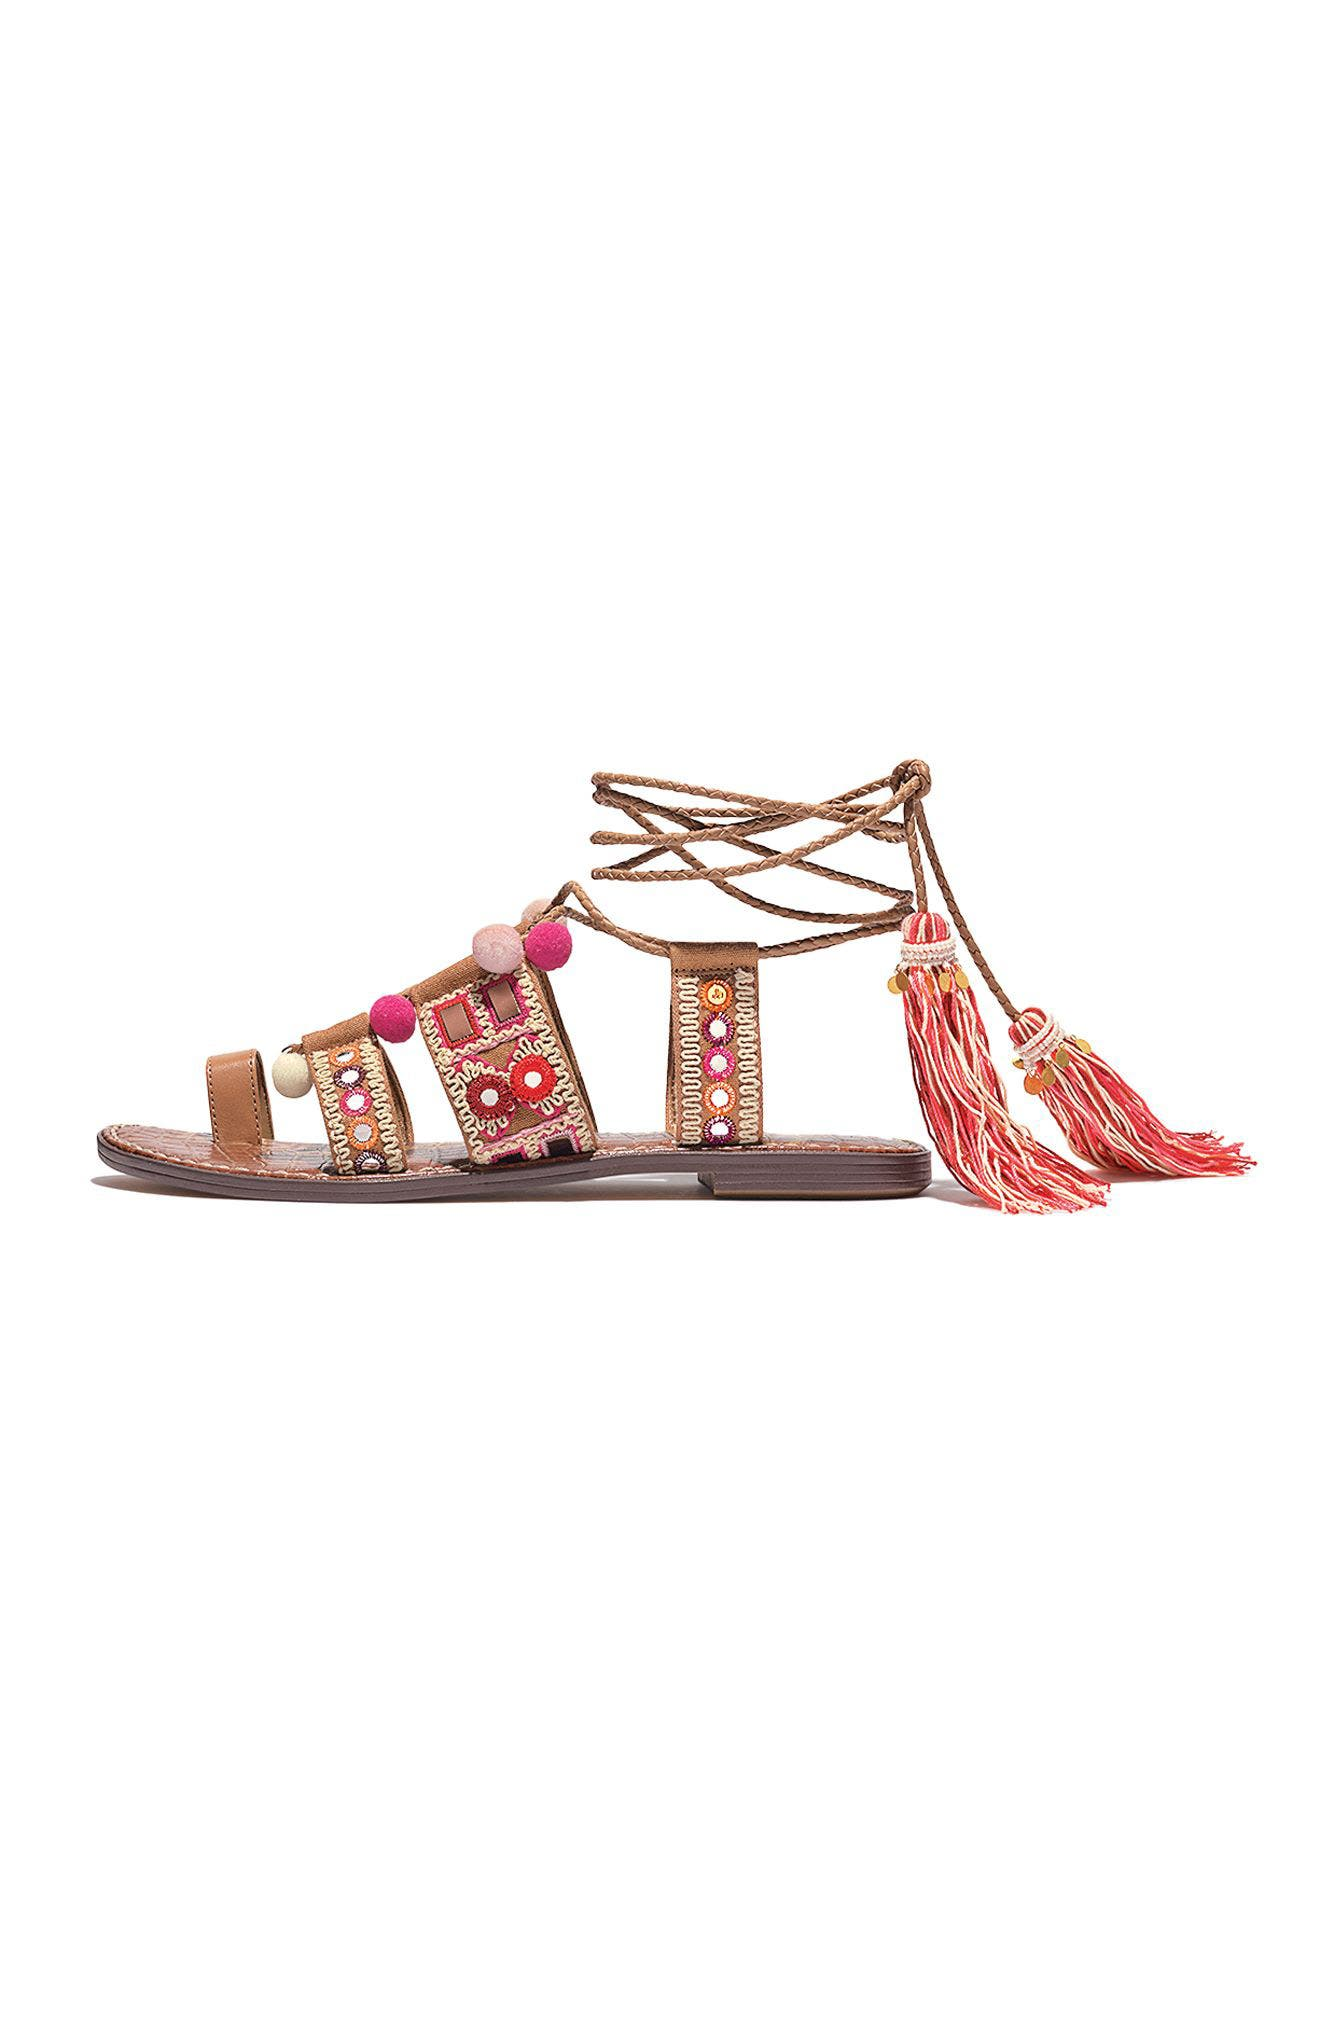 Gretchen Gladiator Sandal,                             Alternate thumbnail 6, color,                             020